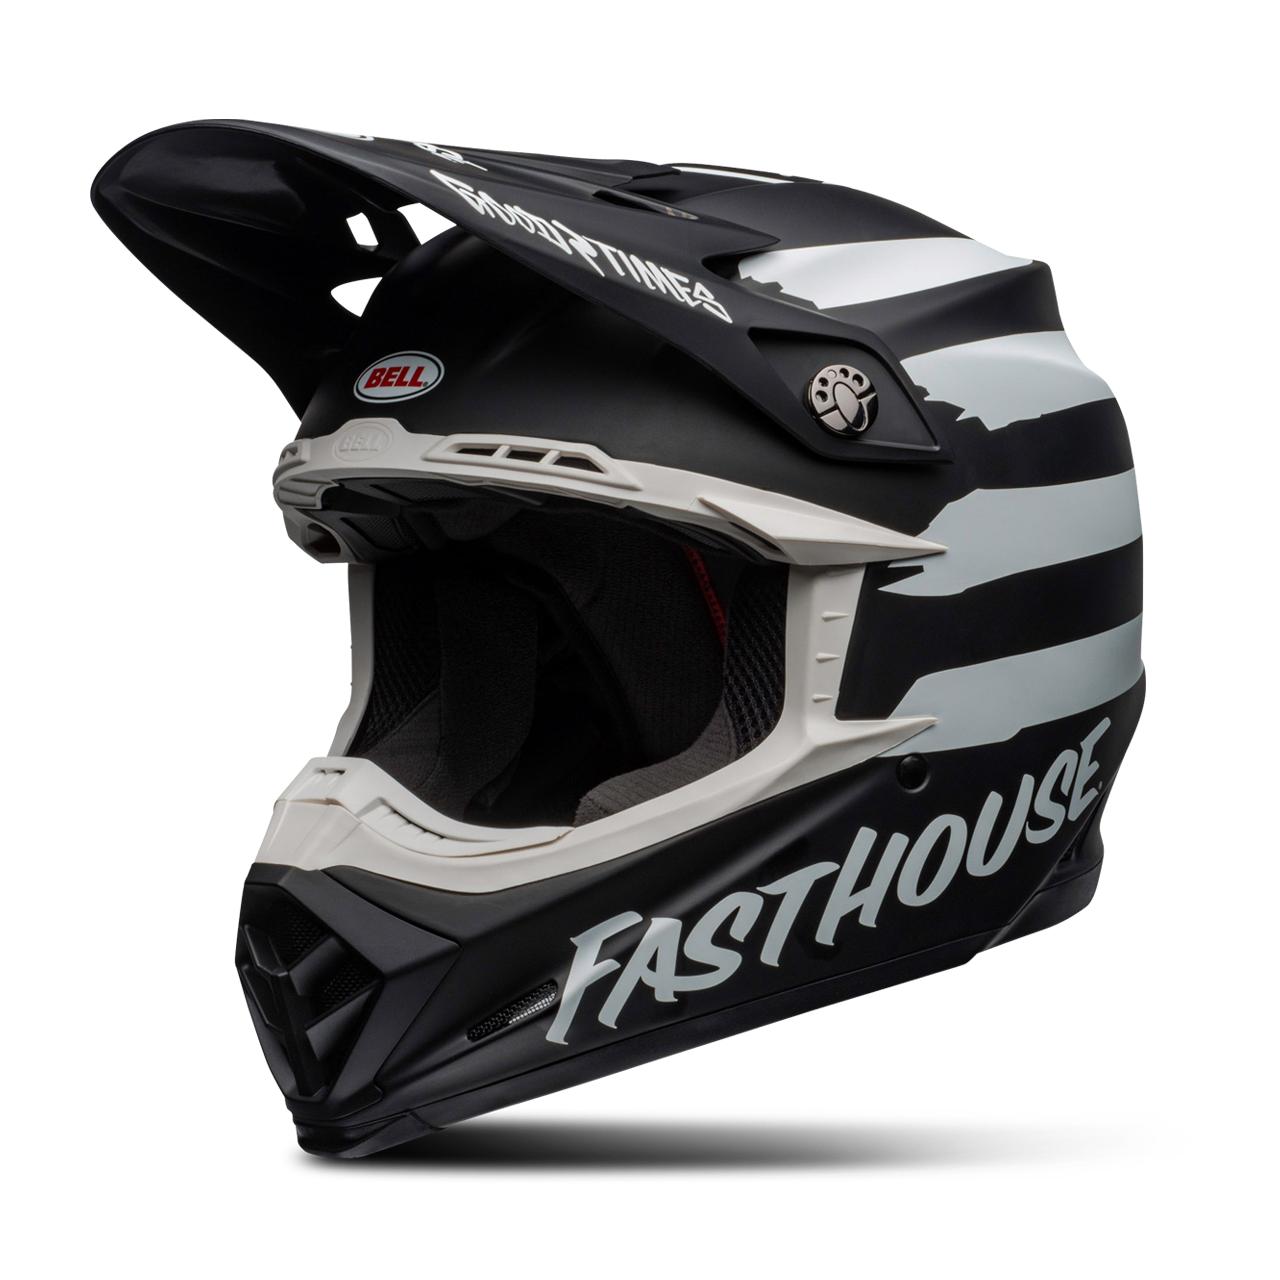 bell casco cross  moto-9 mips fasthouse signia nero-bianco